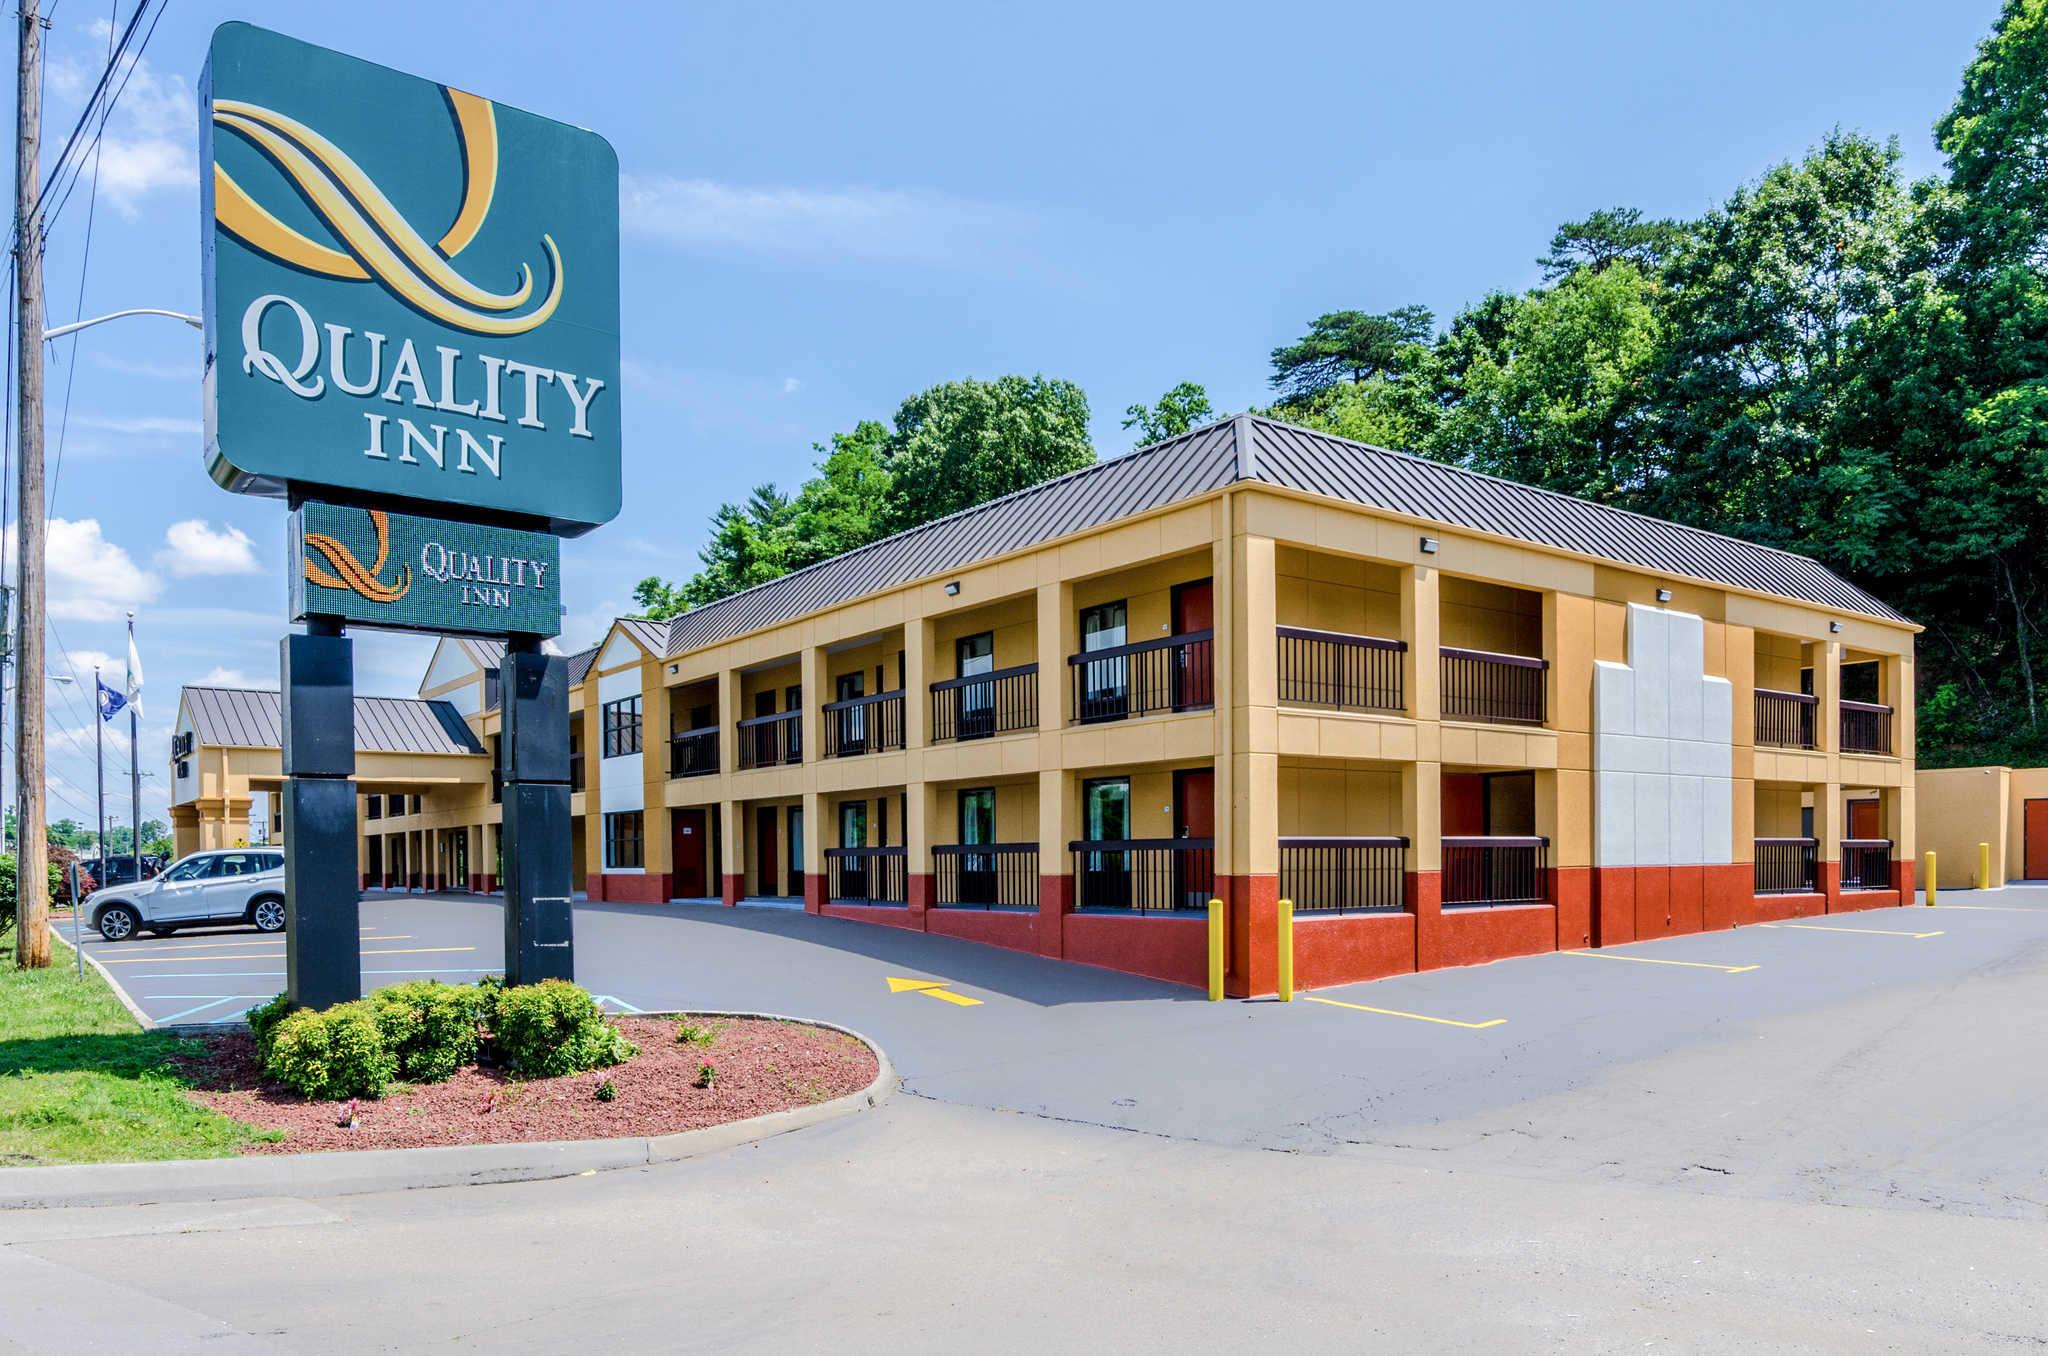 Roanoke Va Hotels With Smoking Rooms